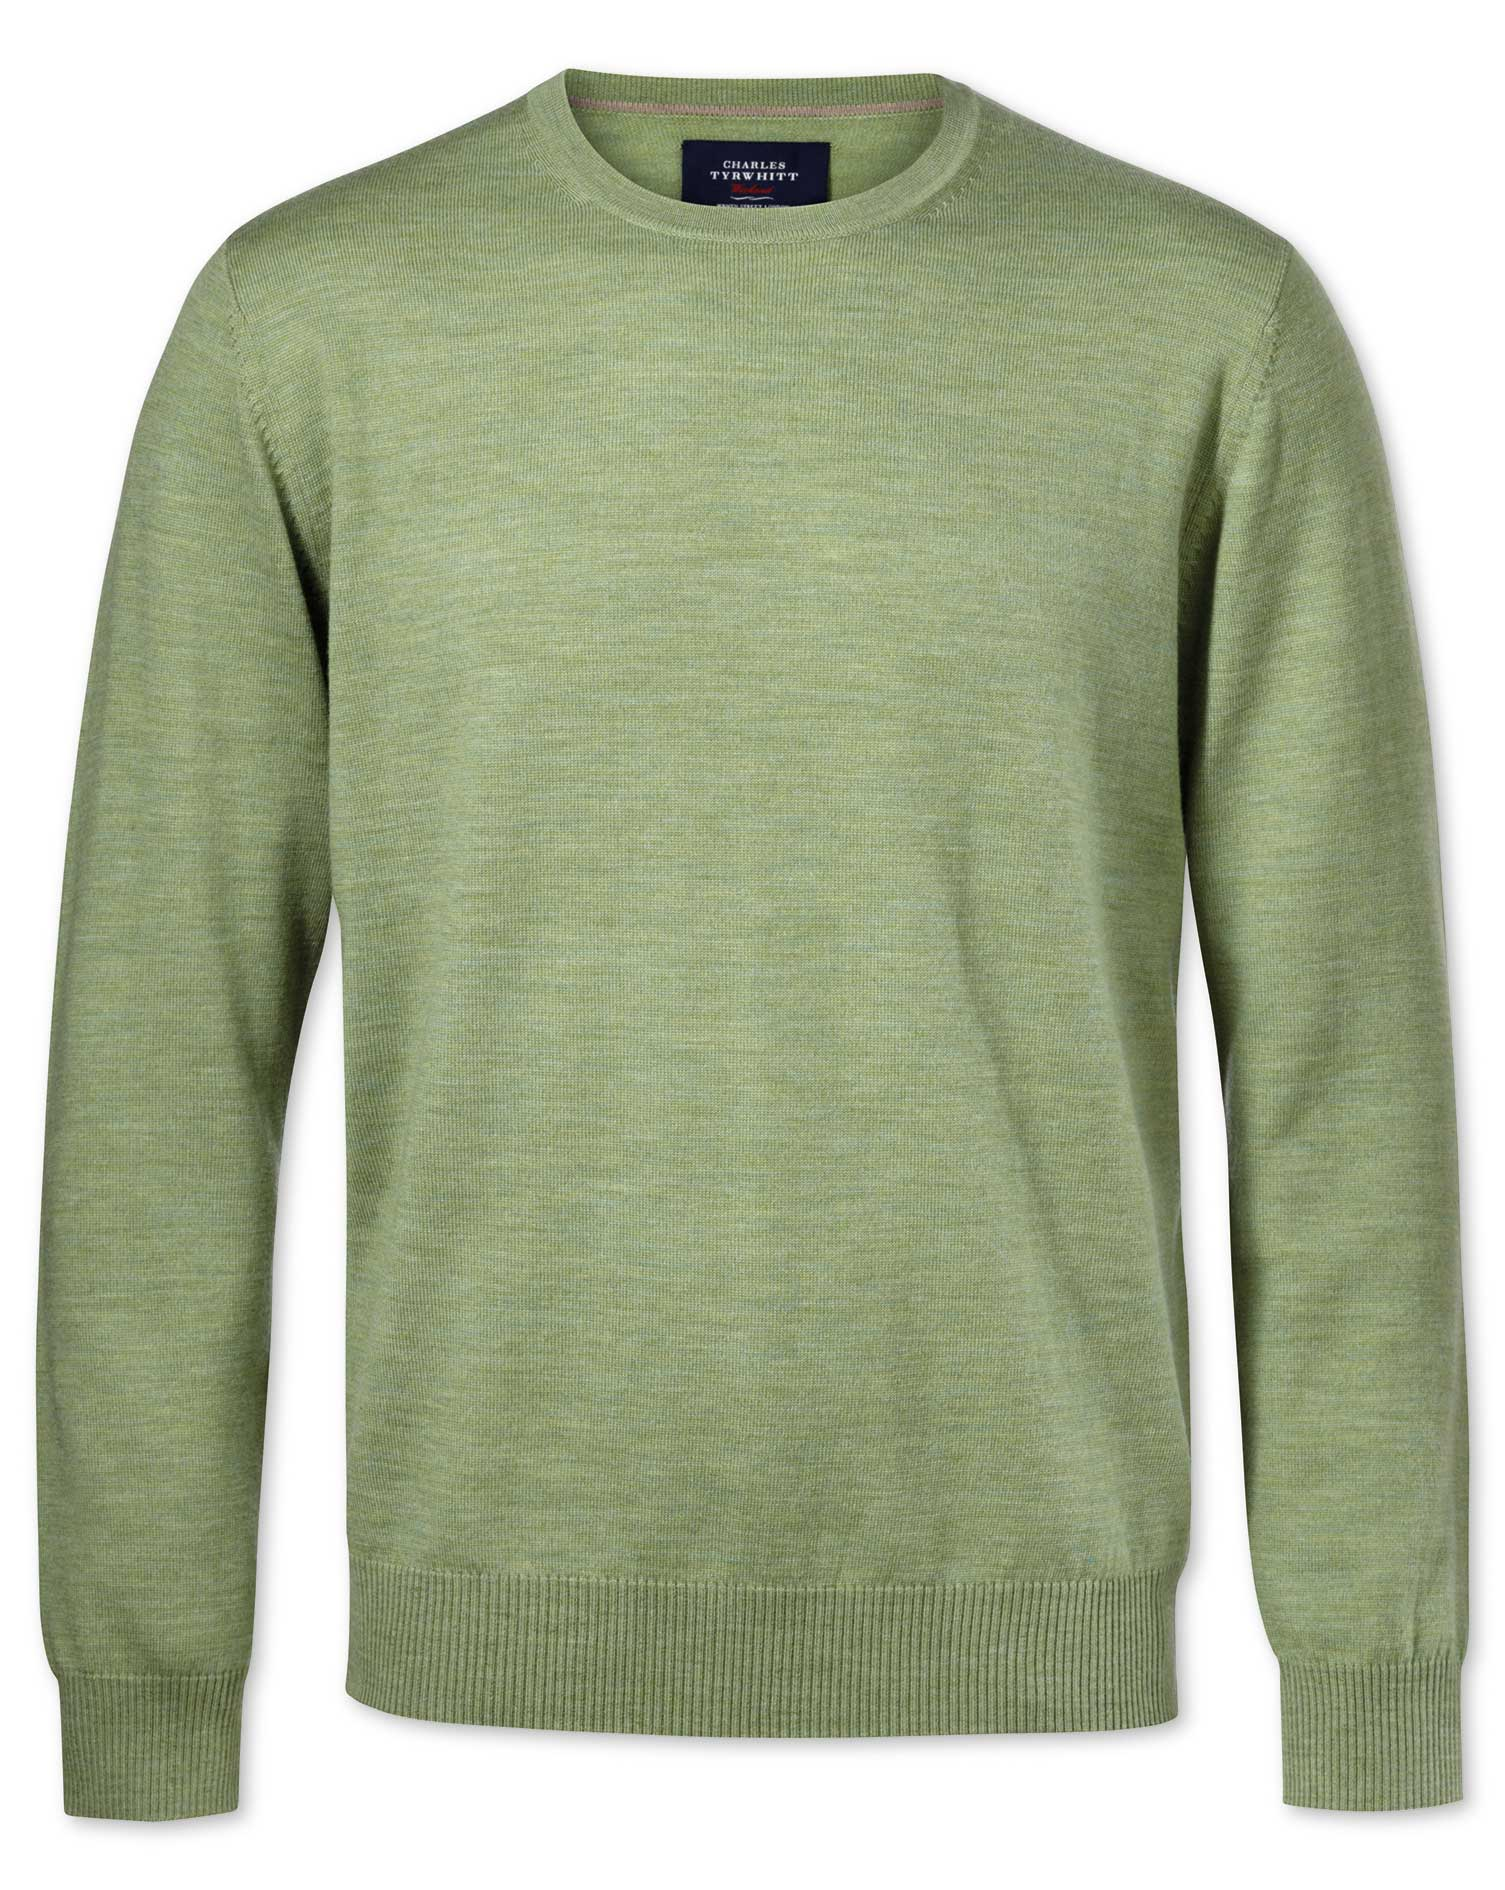 Light Green Merino Wool Crew Neck Jumper Size XXL by Charles Tyrwhitt